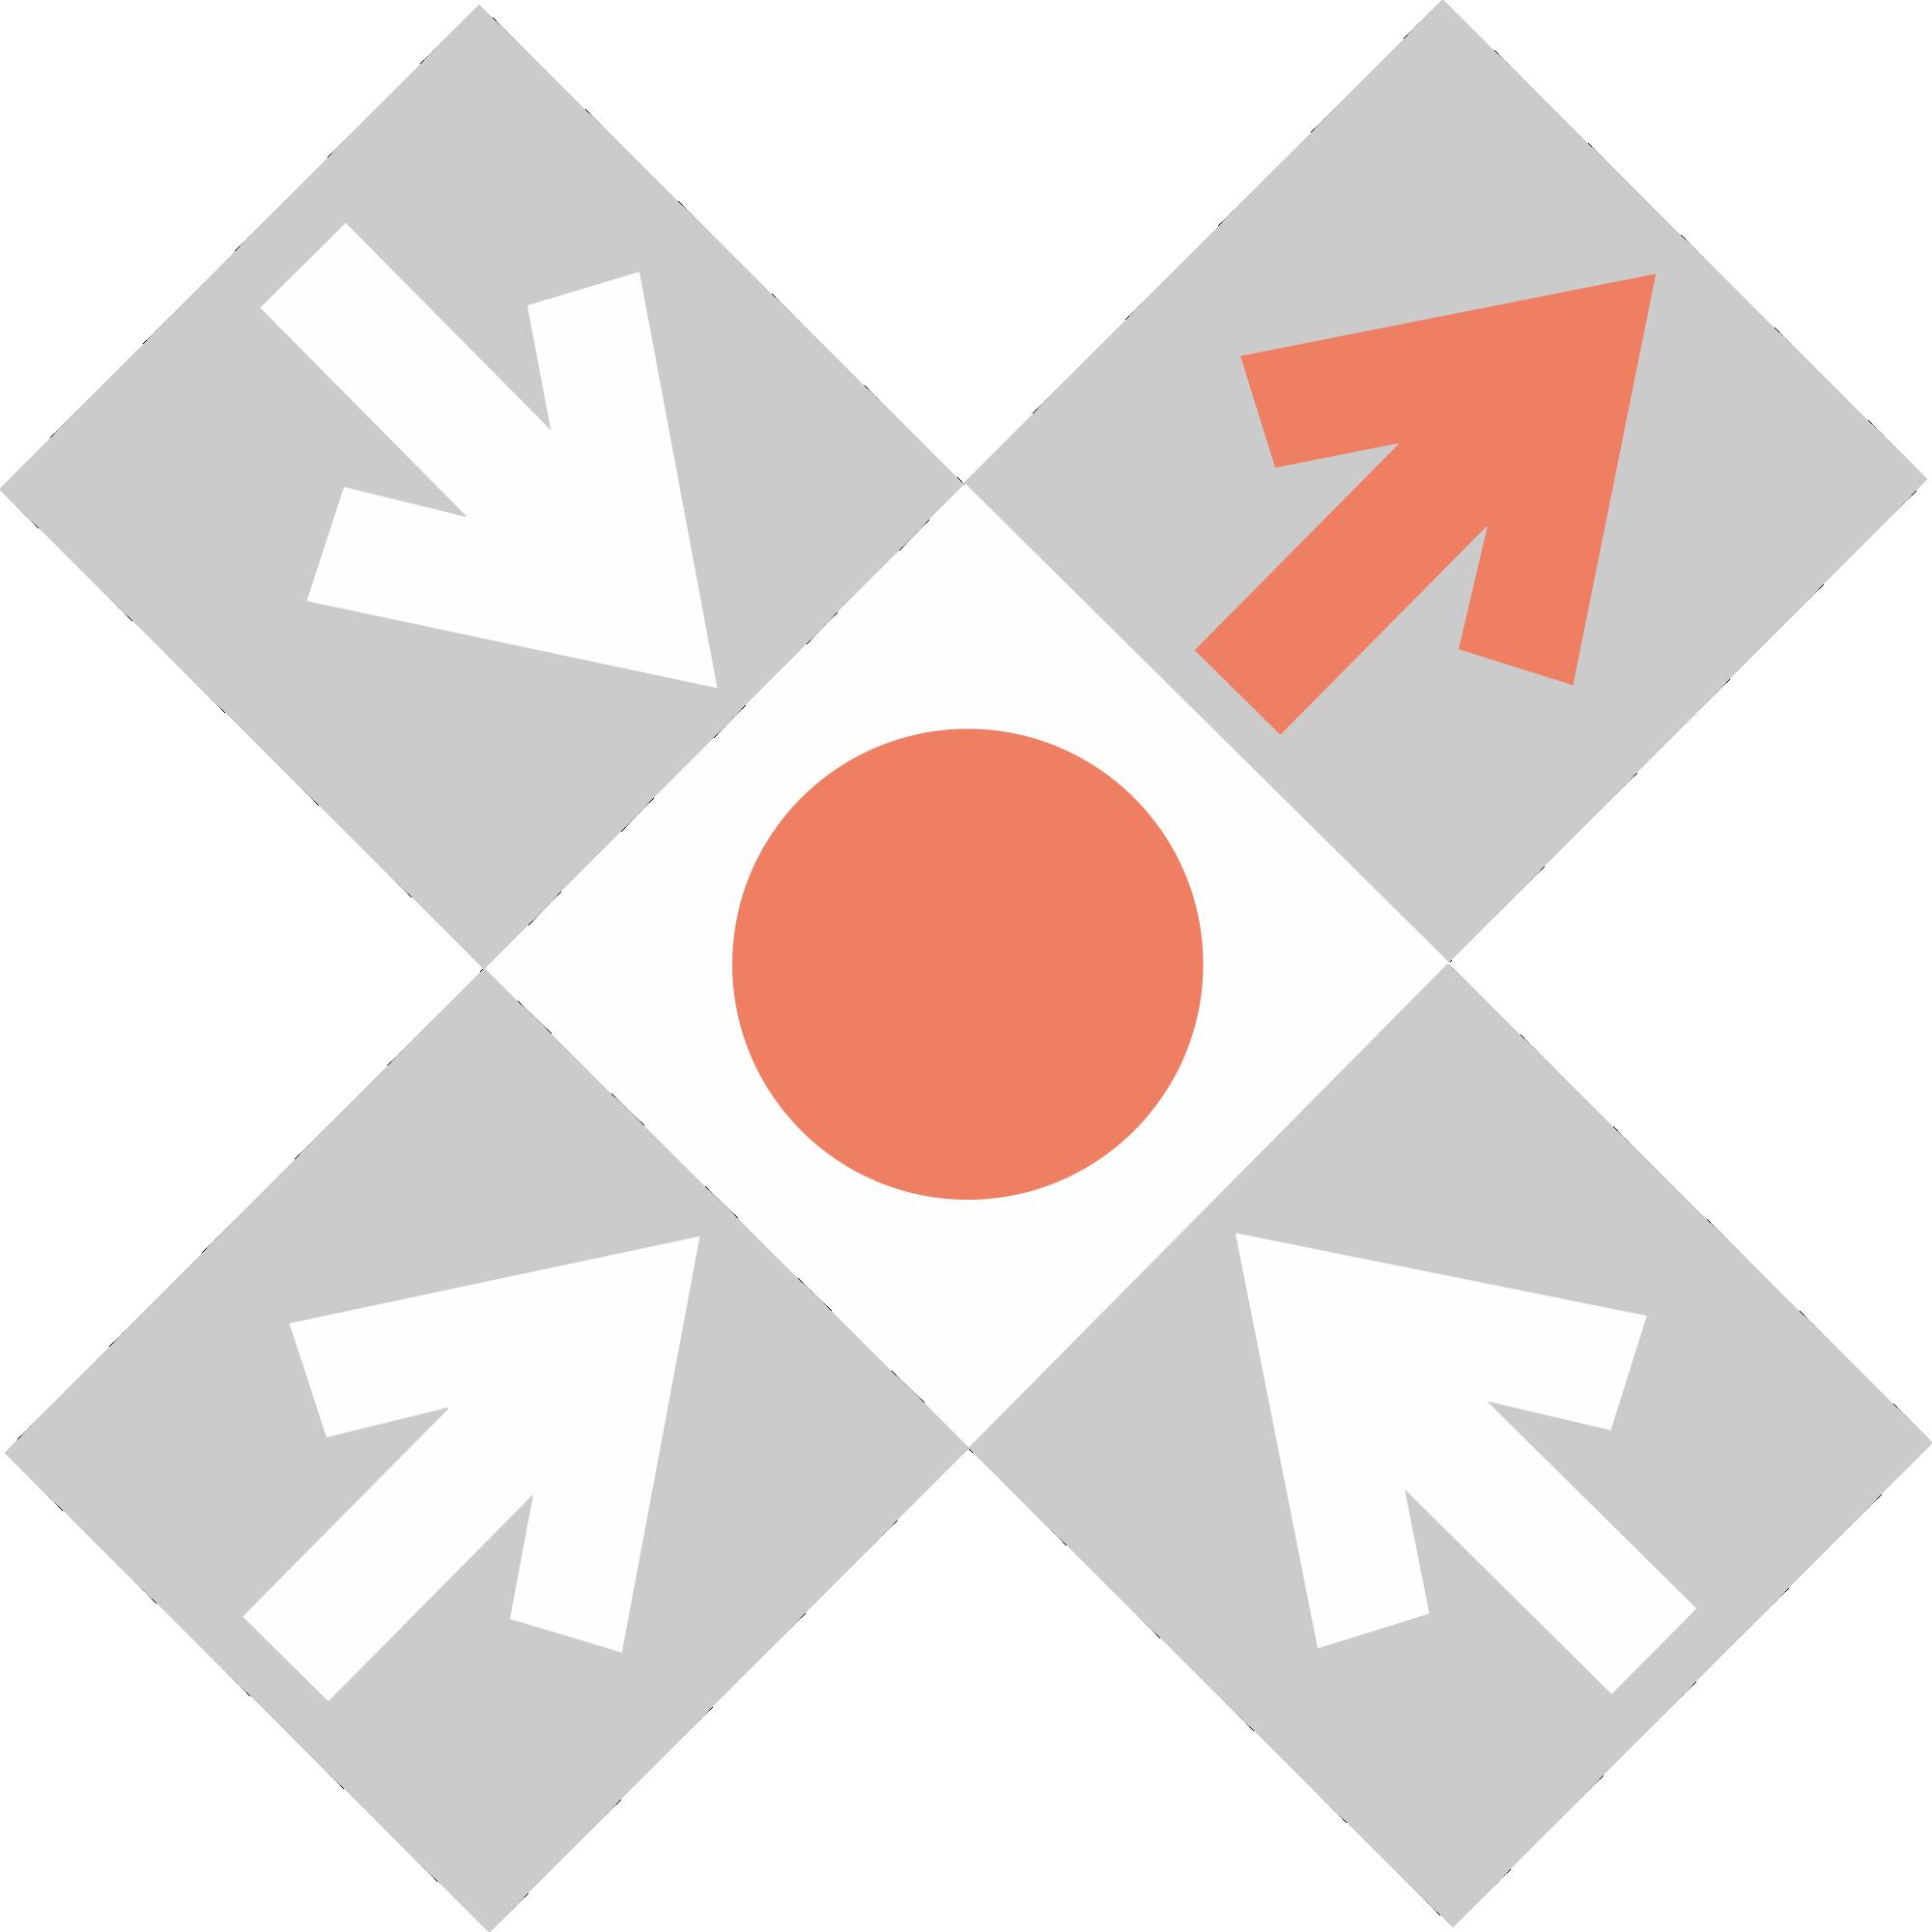 Seminarkontor GmbH